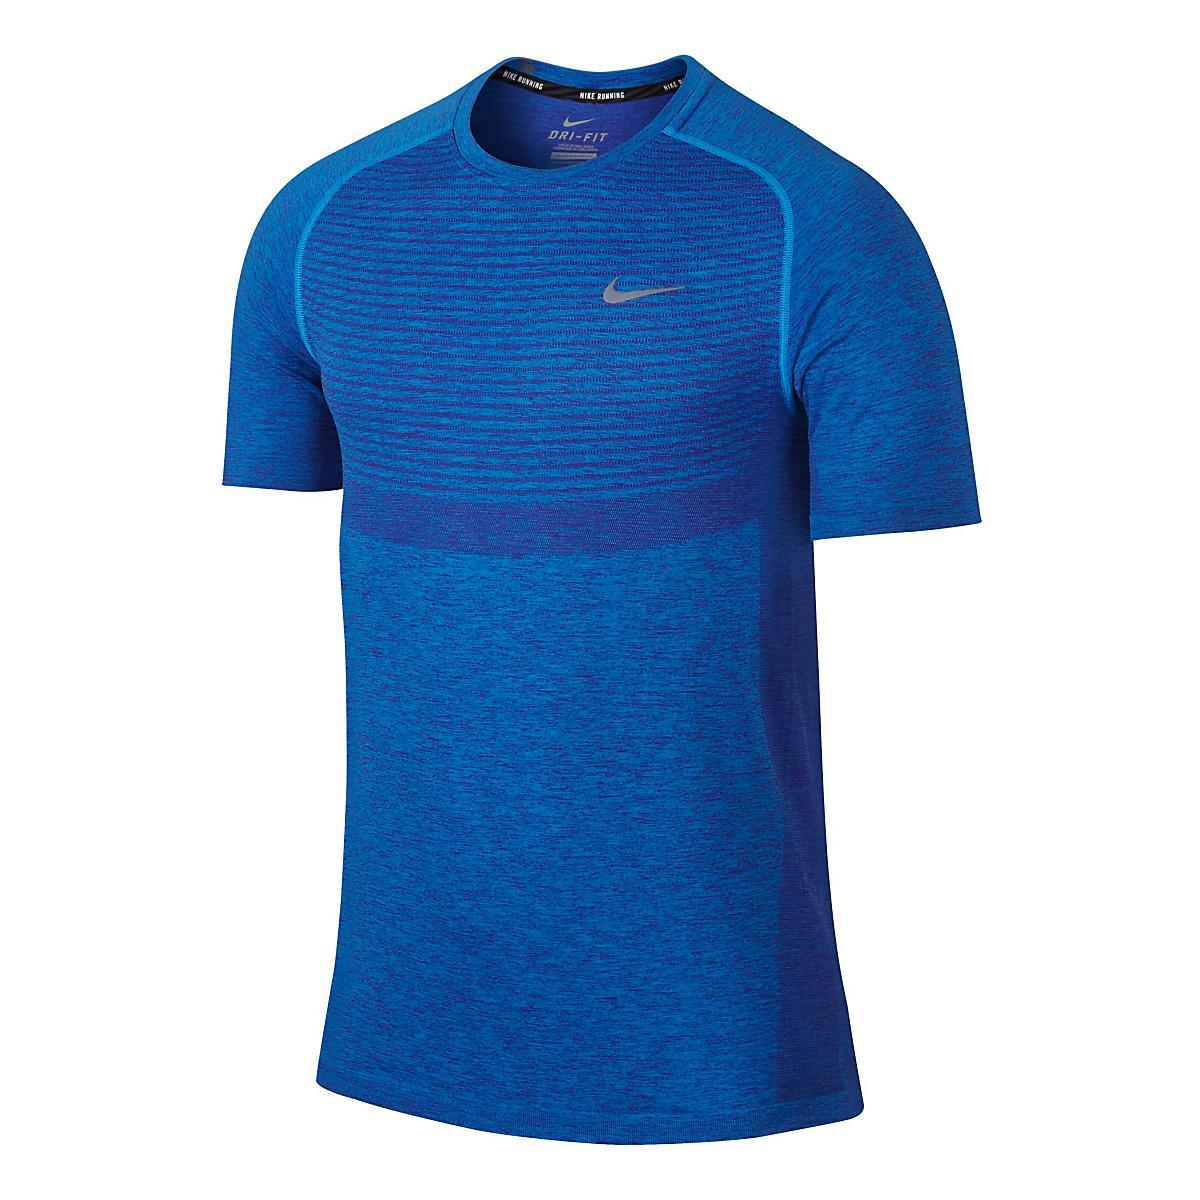 Men's Nike�Dri-Fit Knit Short Sleeve